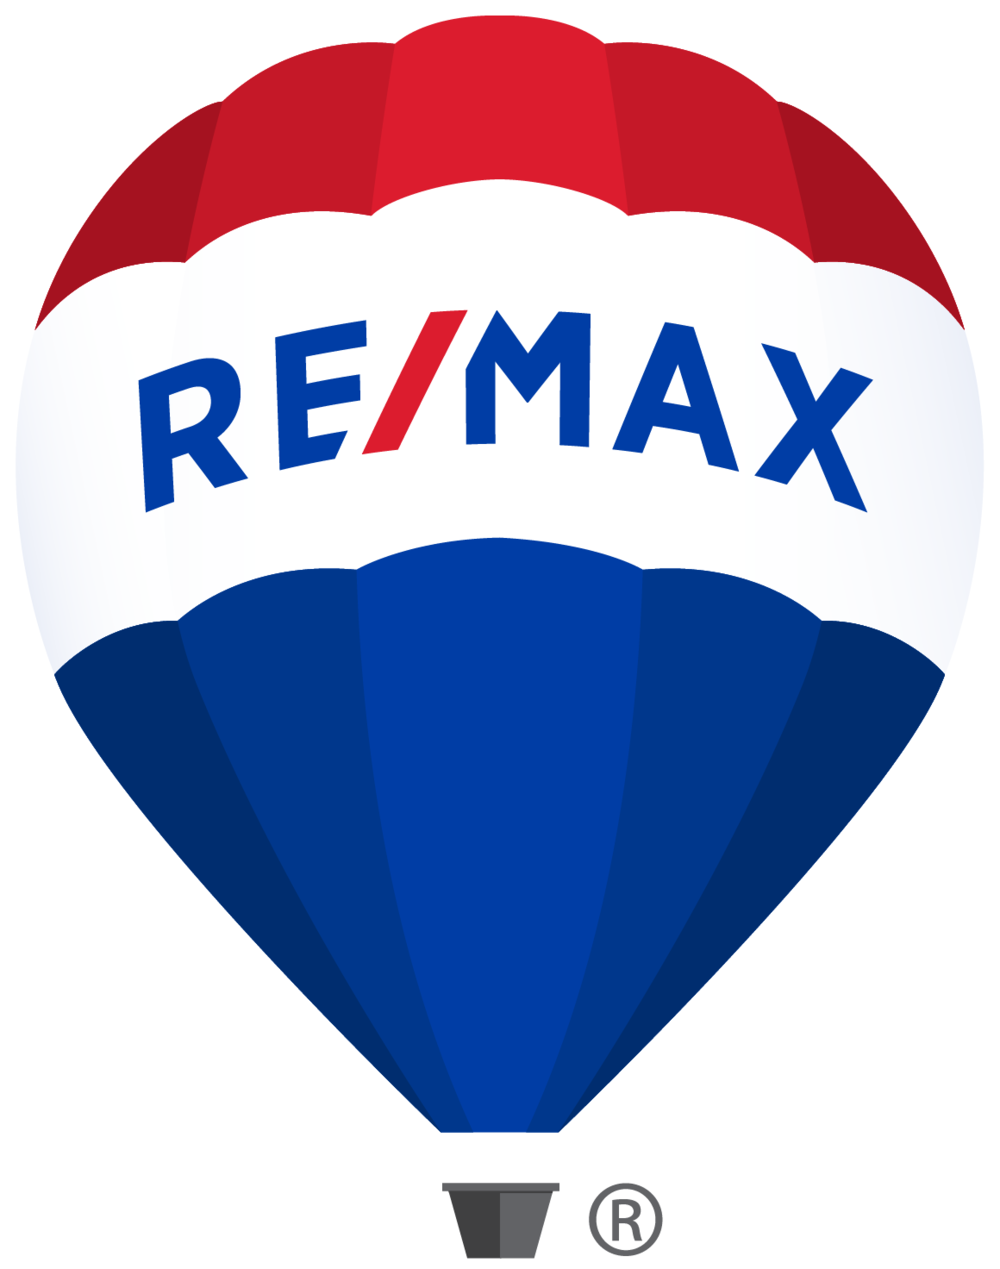 RE/MAX balloon .png web transparent